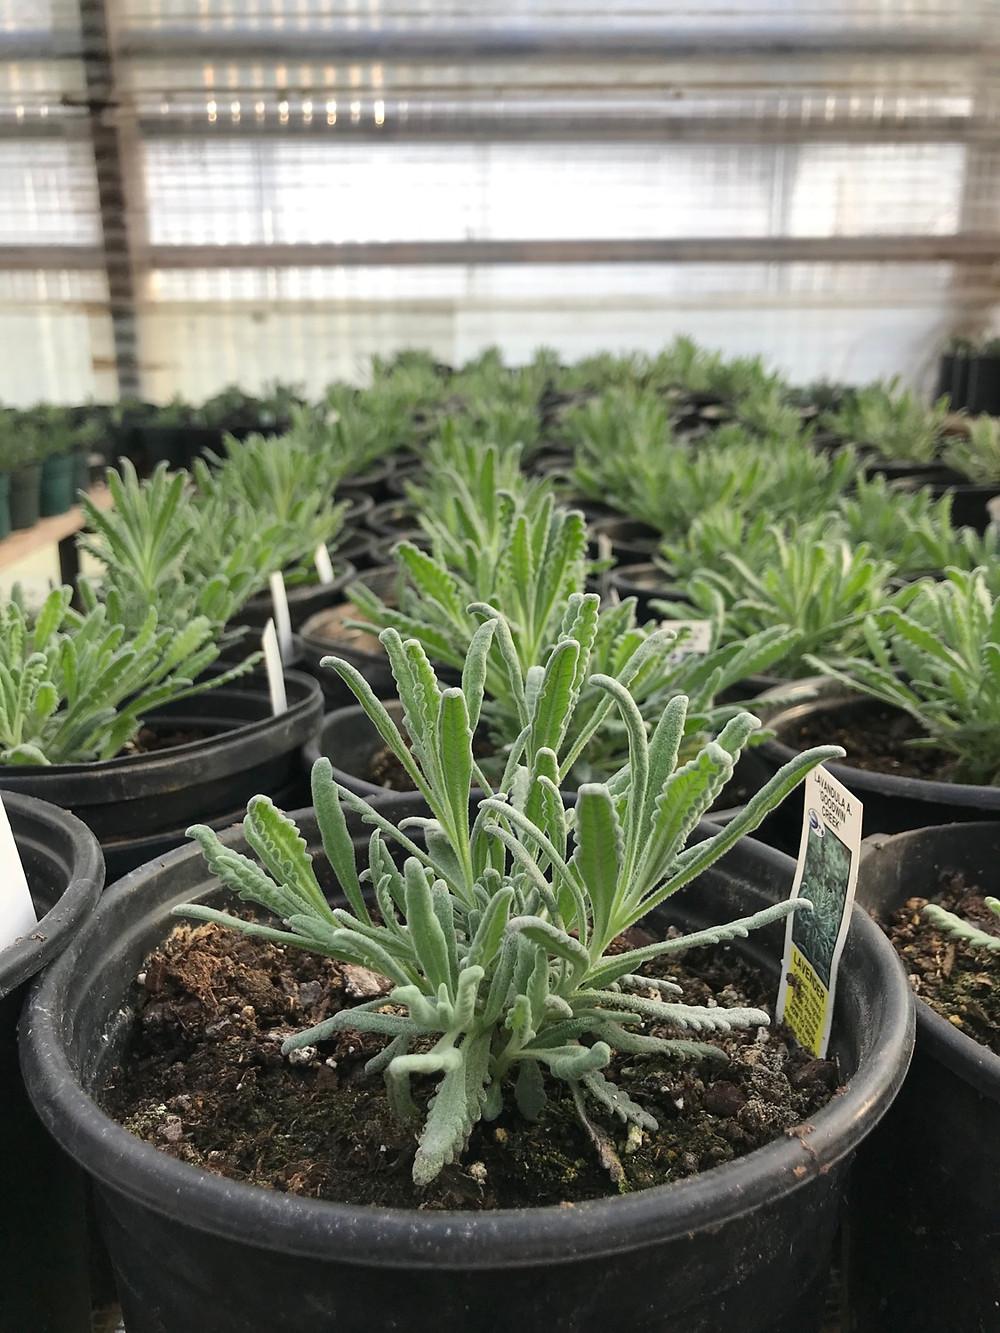 Goodwin Creek lavender.  Does great in pots!